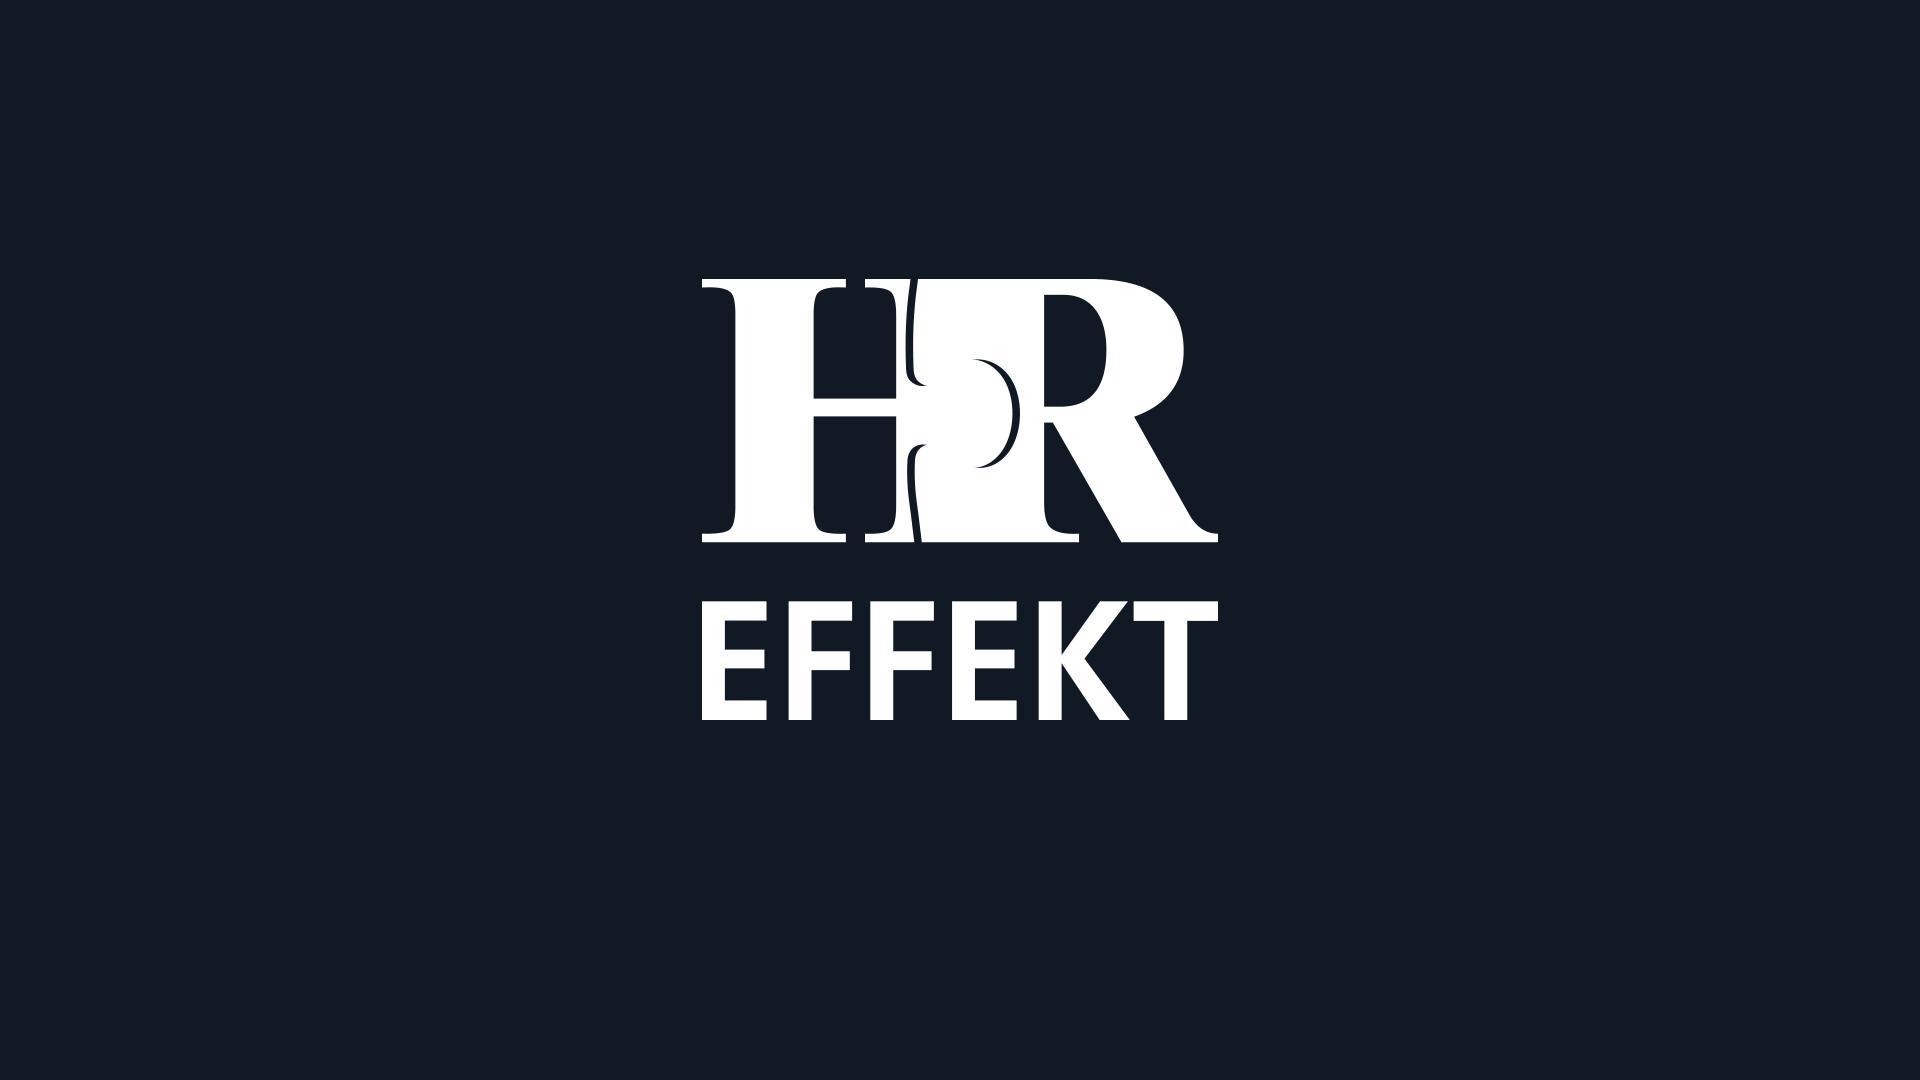 HR EFFEKT varumärke